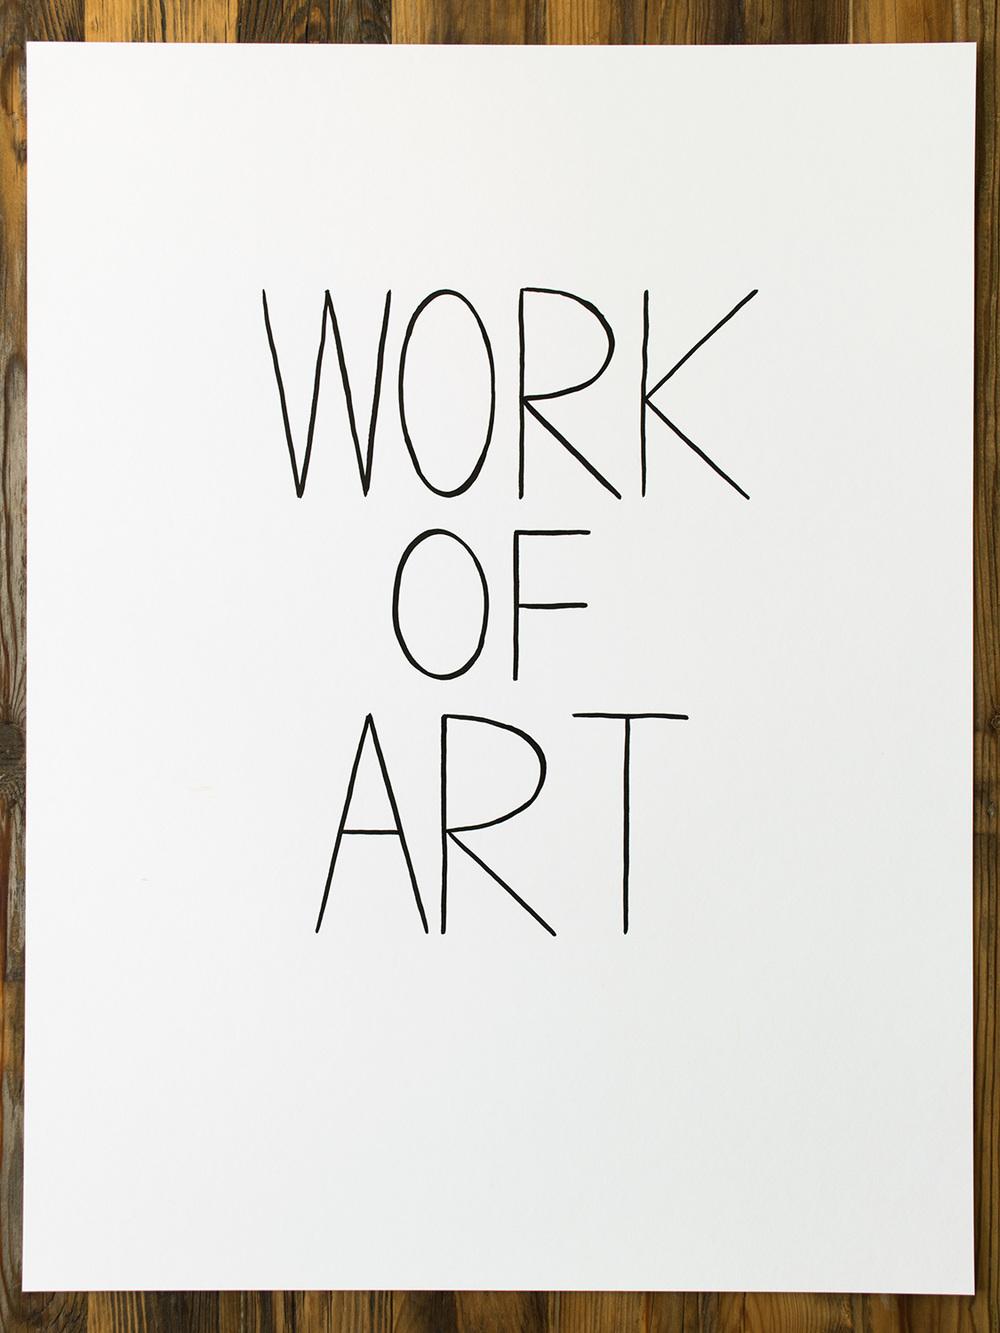 work_of_art-1500x1125.jpg